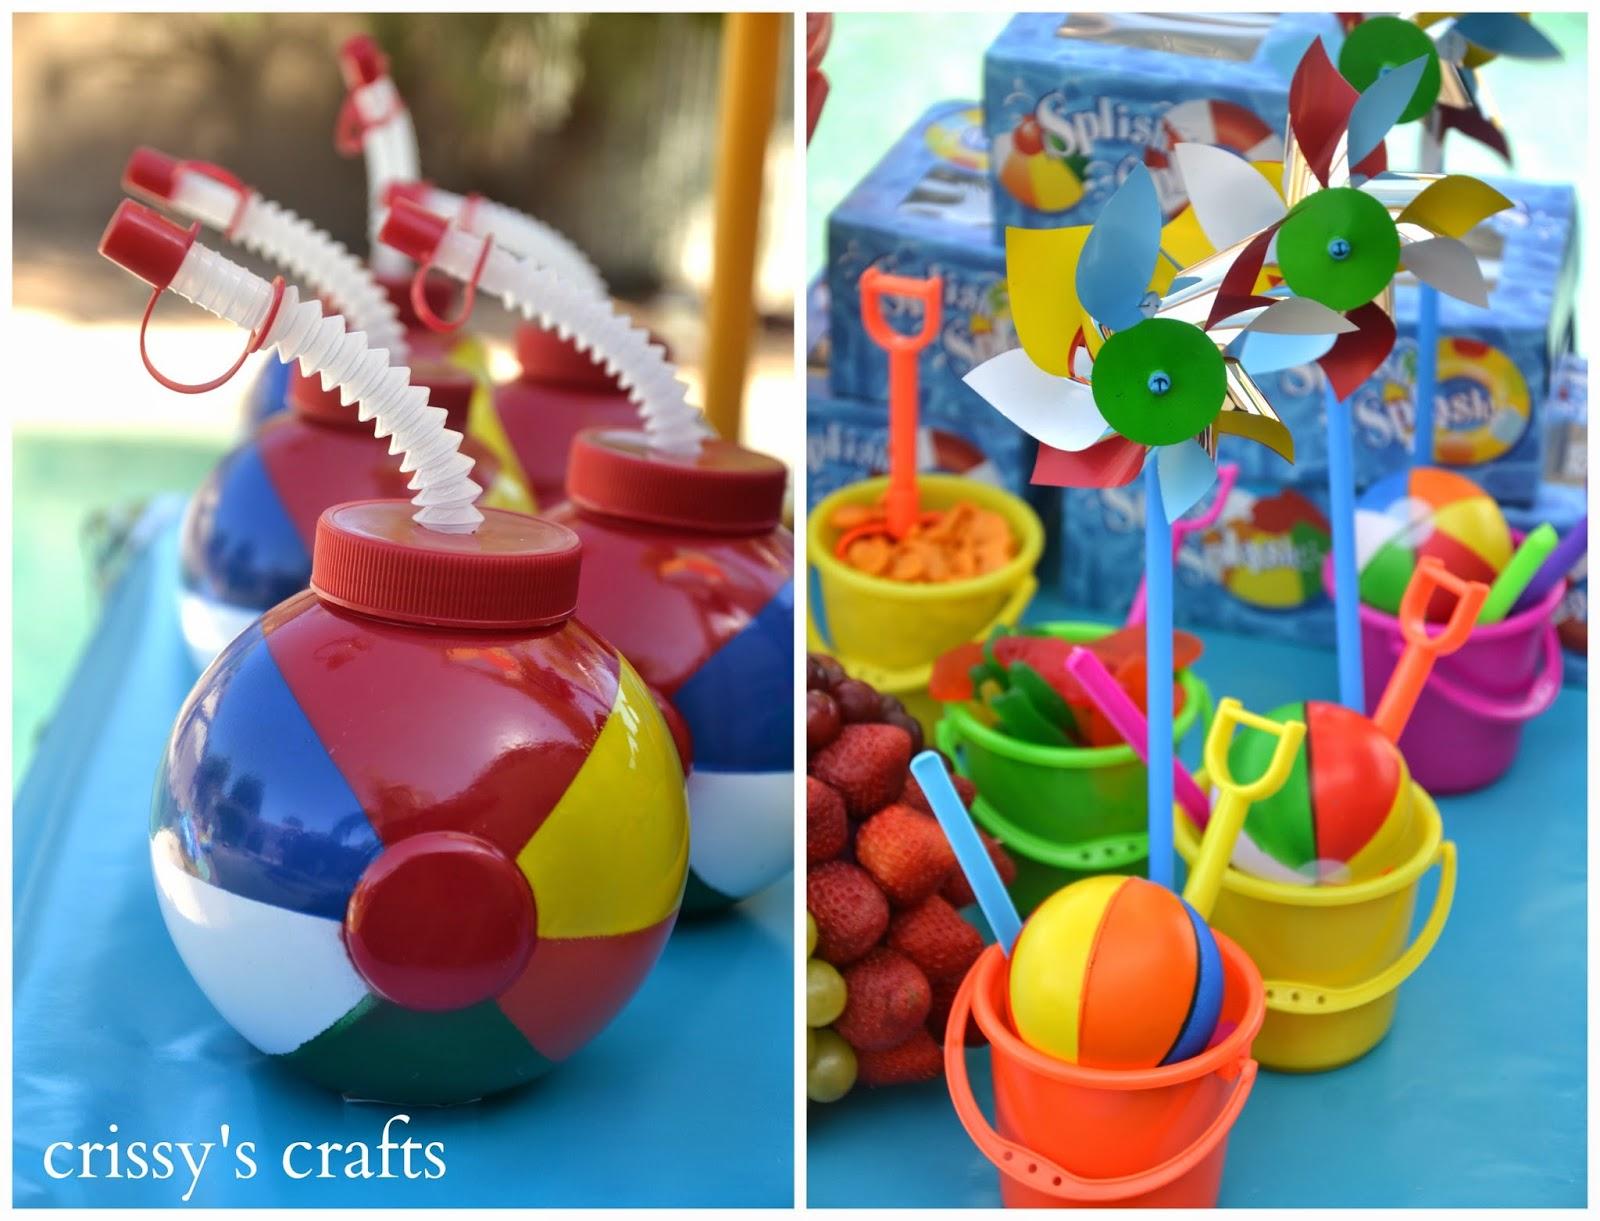 Crissy's Crafts: July 2014